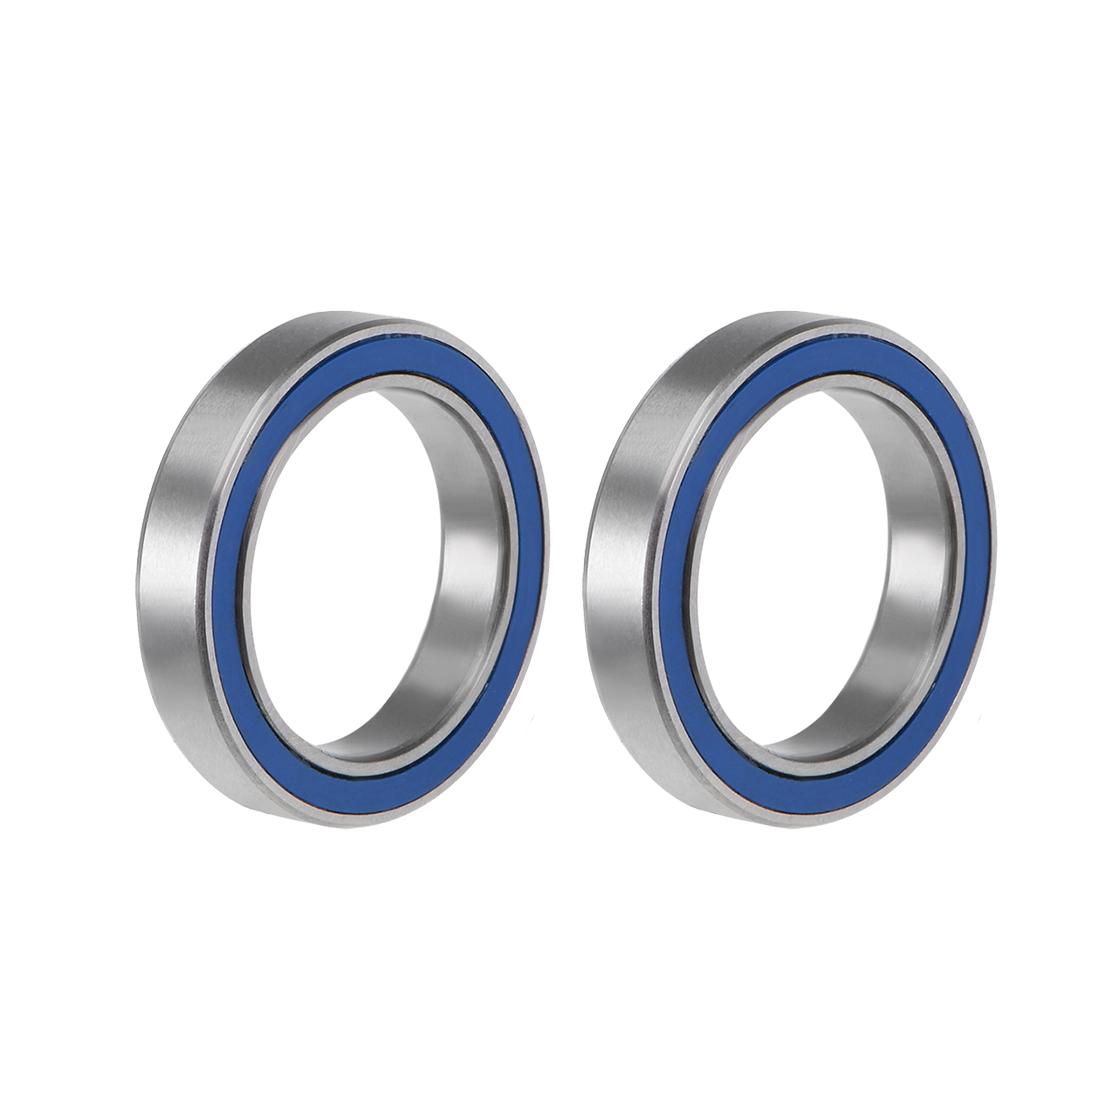 6702-2RS Ball Bearing 15x21x4mm Double Sealed ABEC-3 Bearings 2pcs